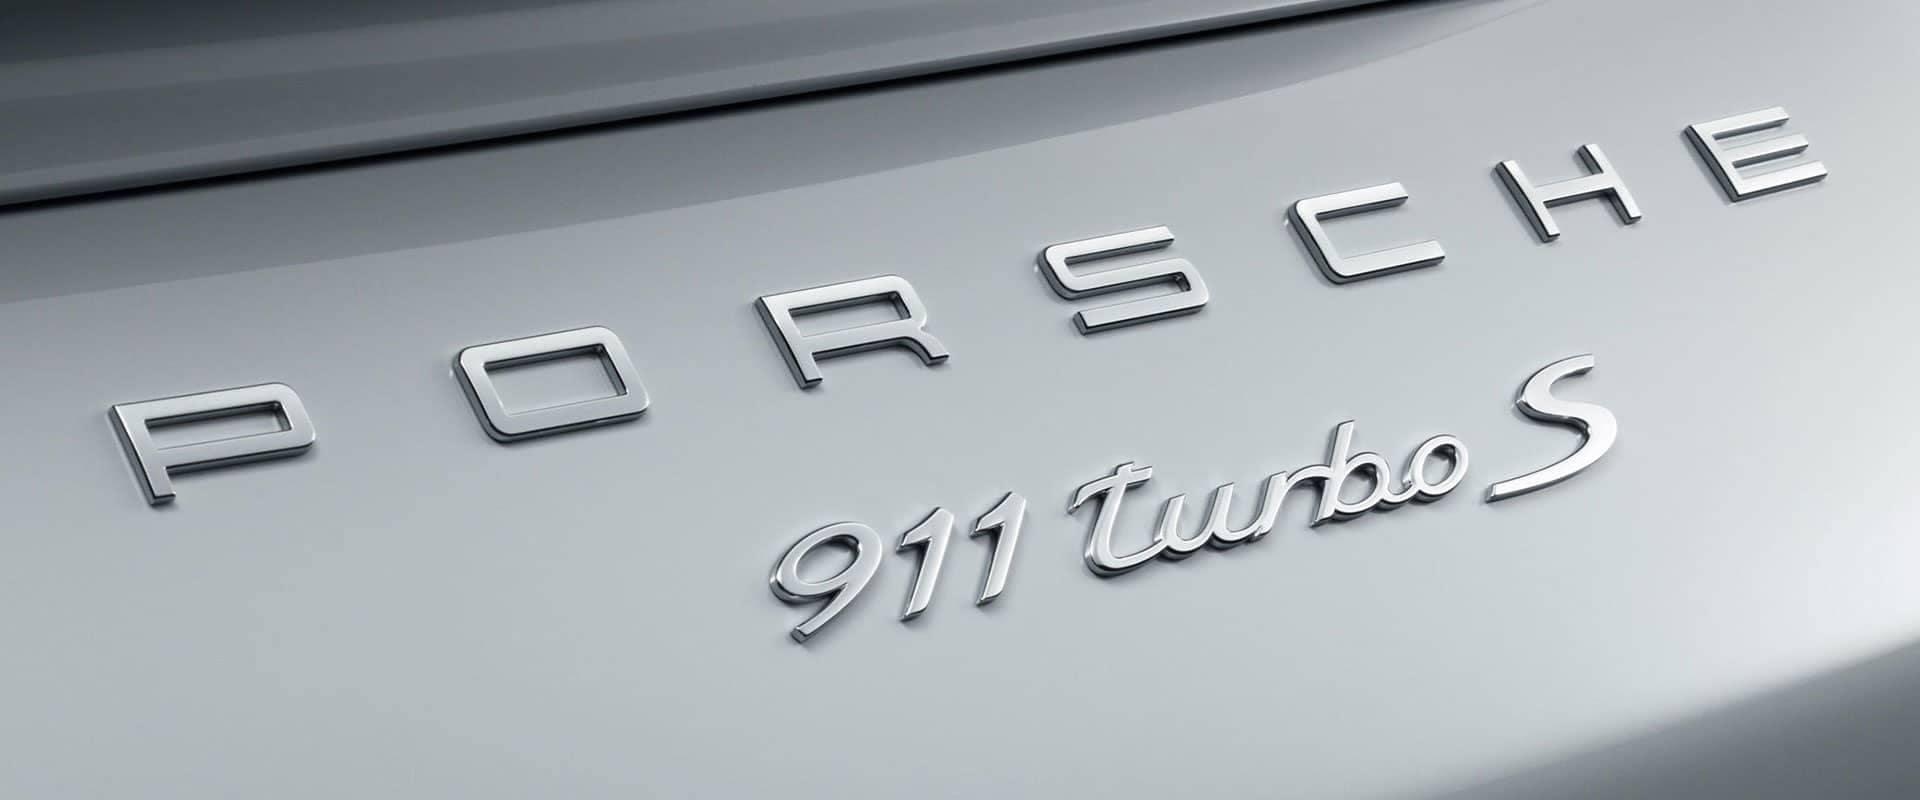 911 Turbo Models